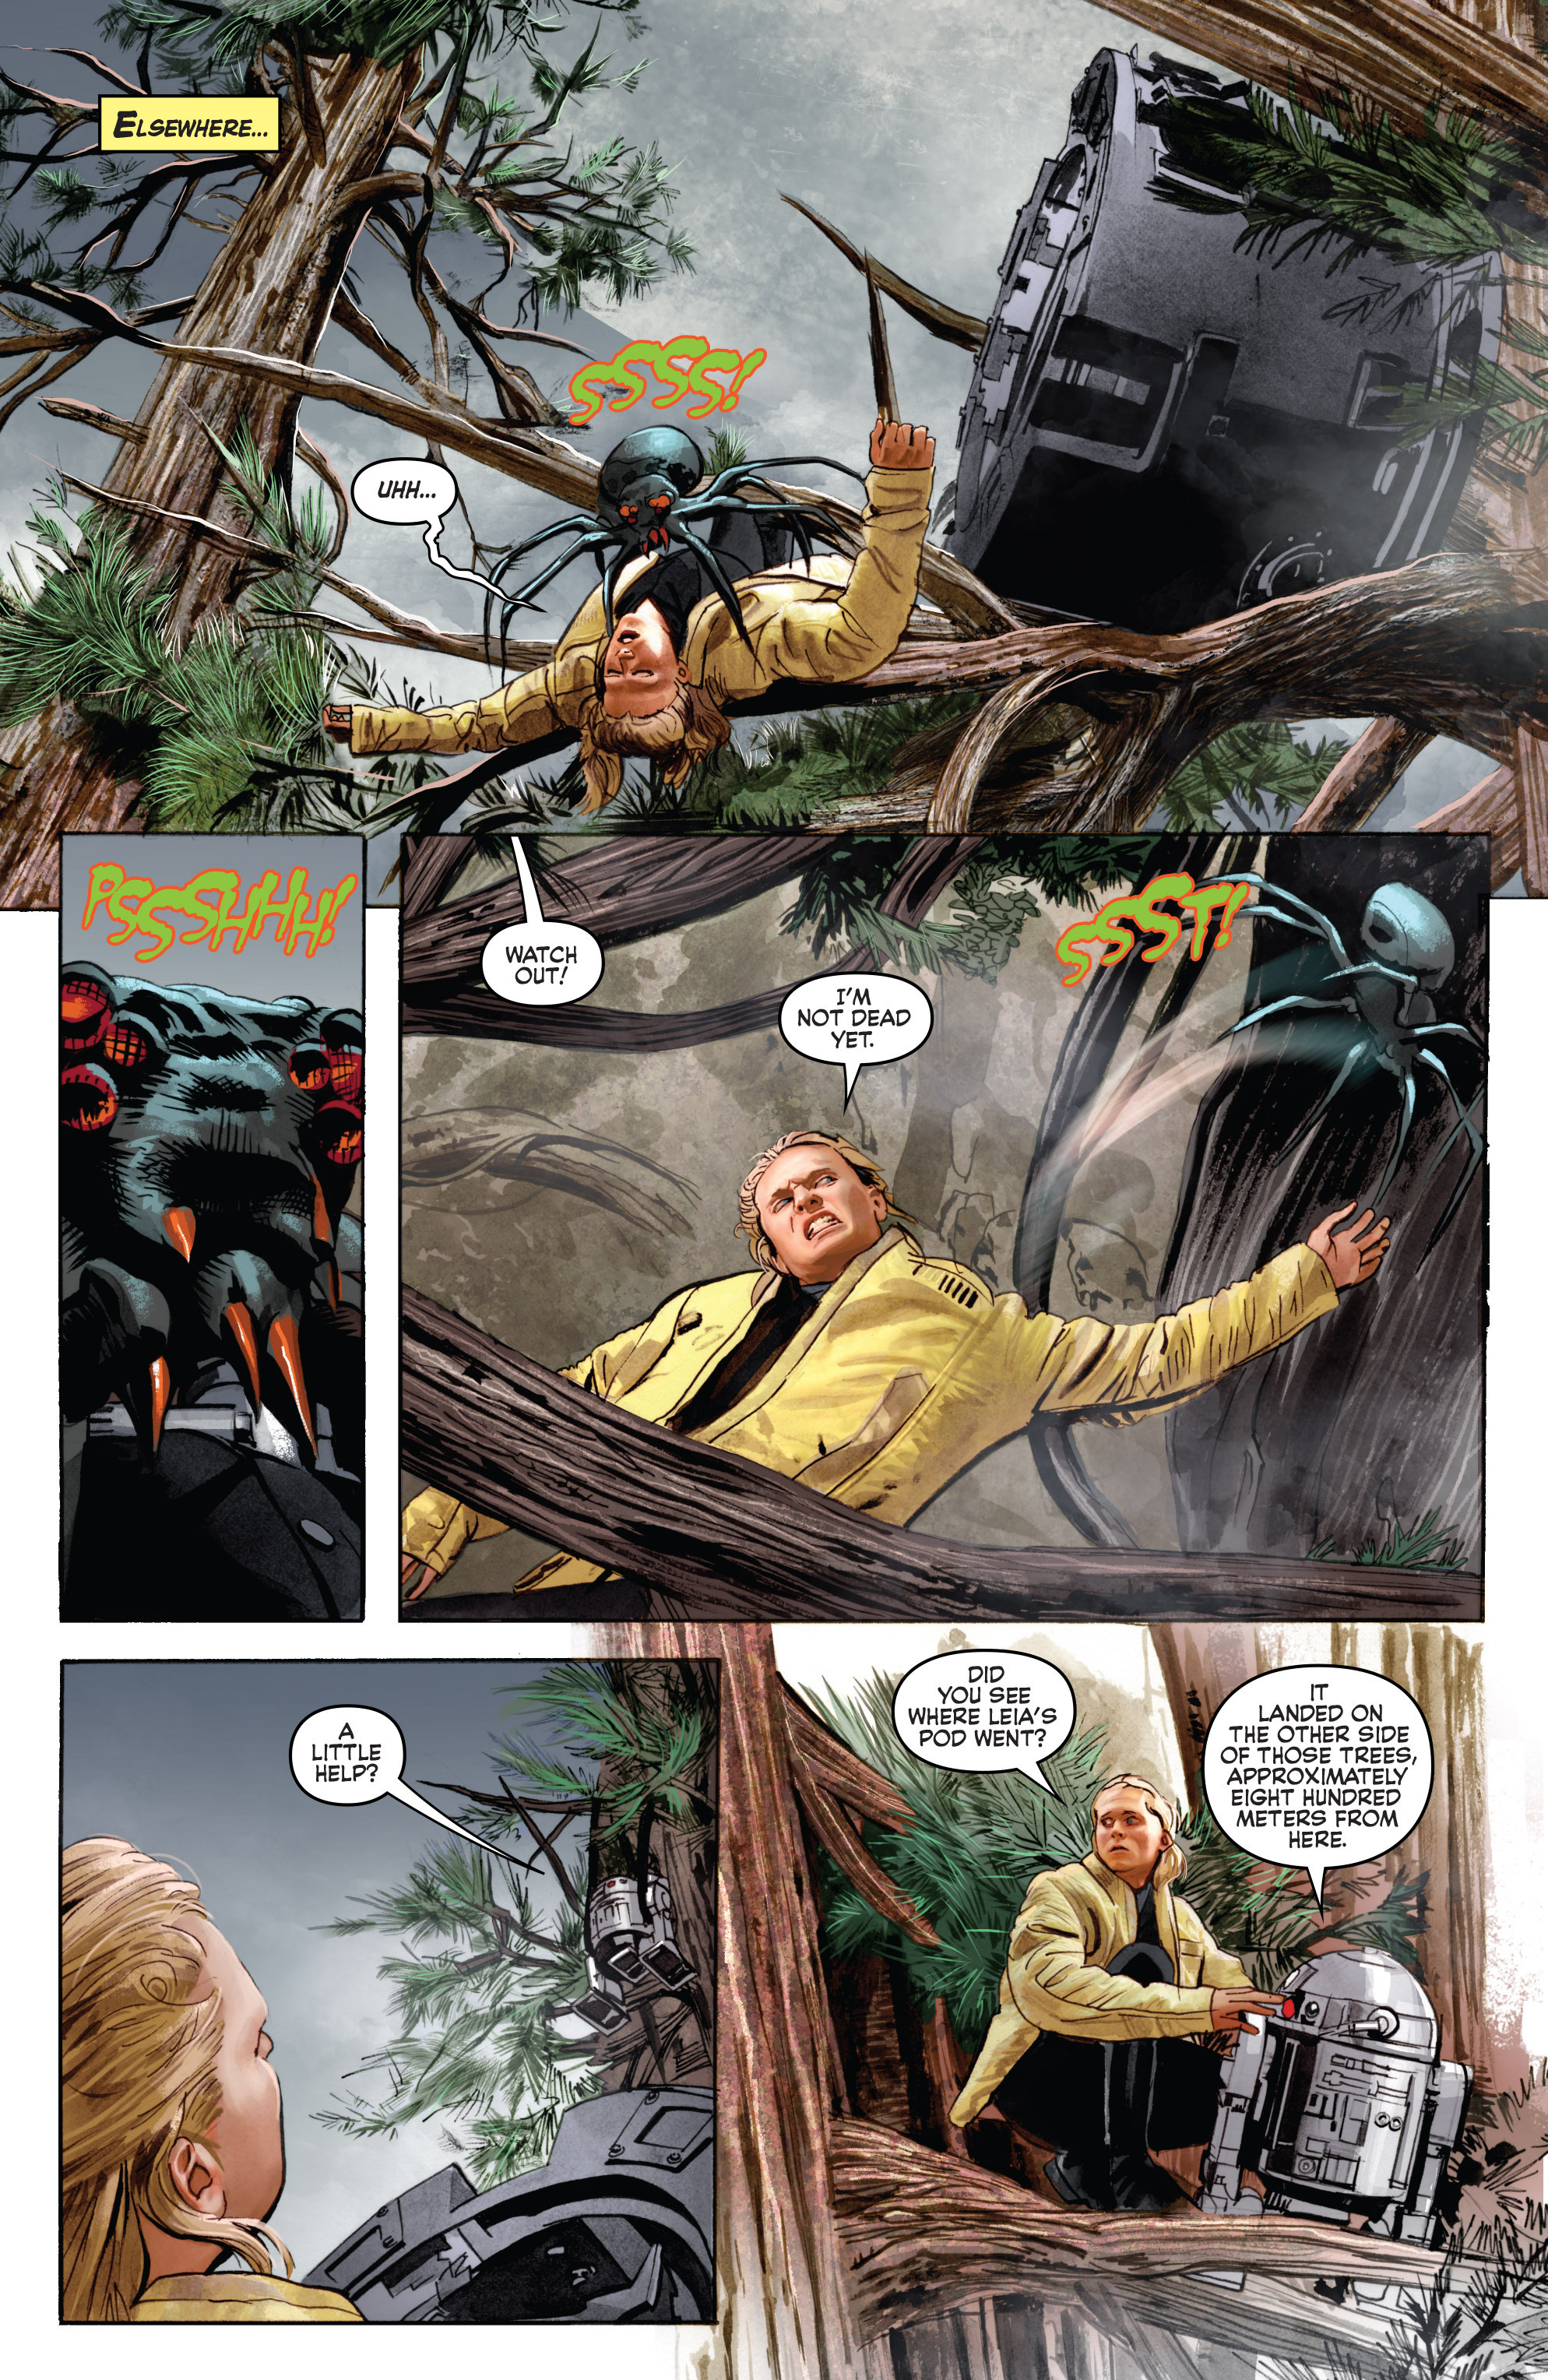 THE STAR WARS comic (2015, Marvel edition) Vol.7 13